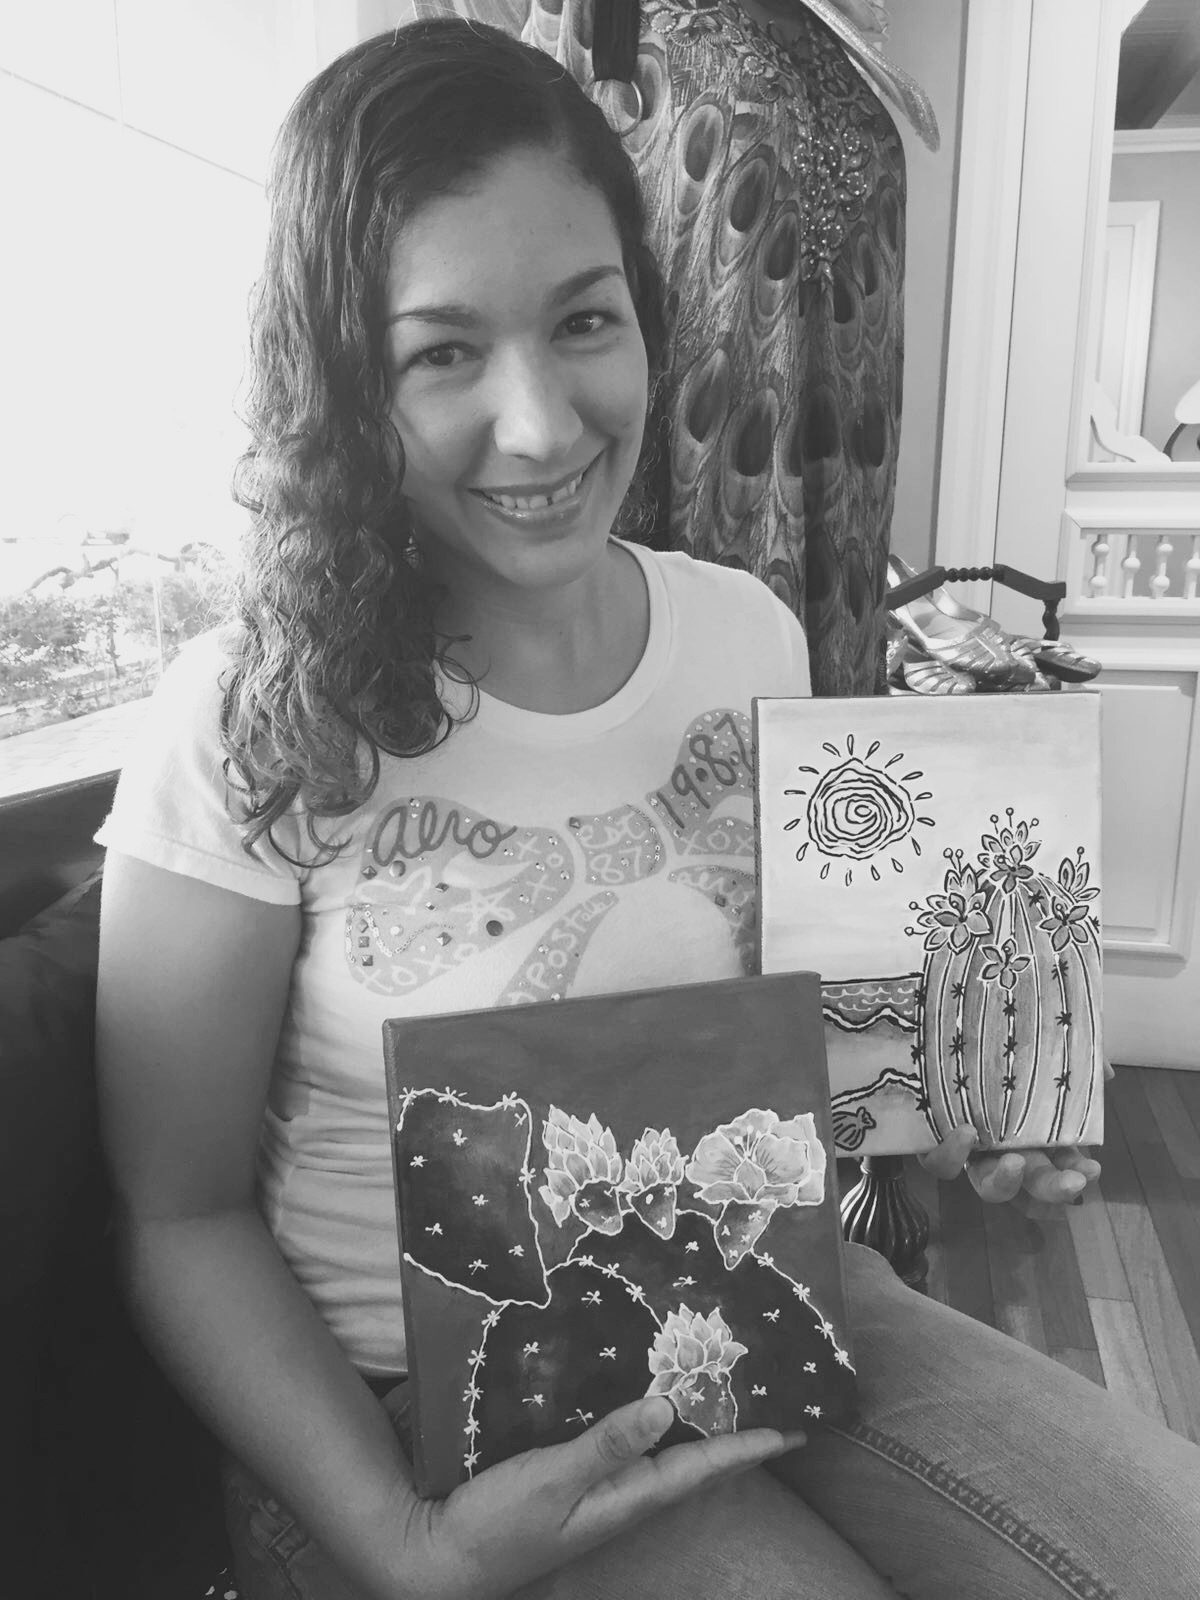 Local Artist Carla Giglione Guillen is Caribbean Queen for February 2016